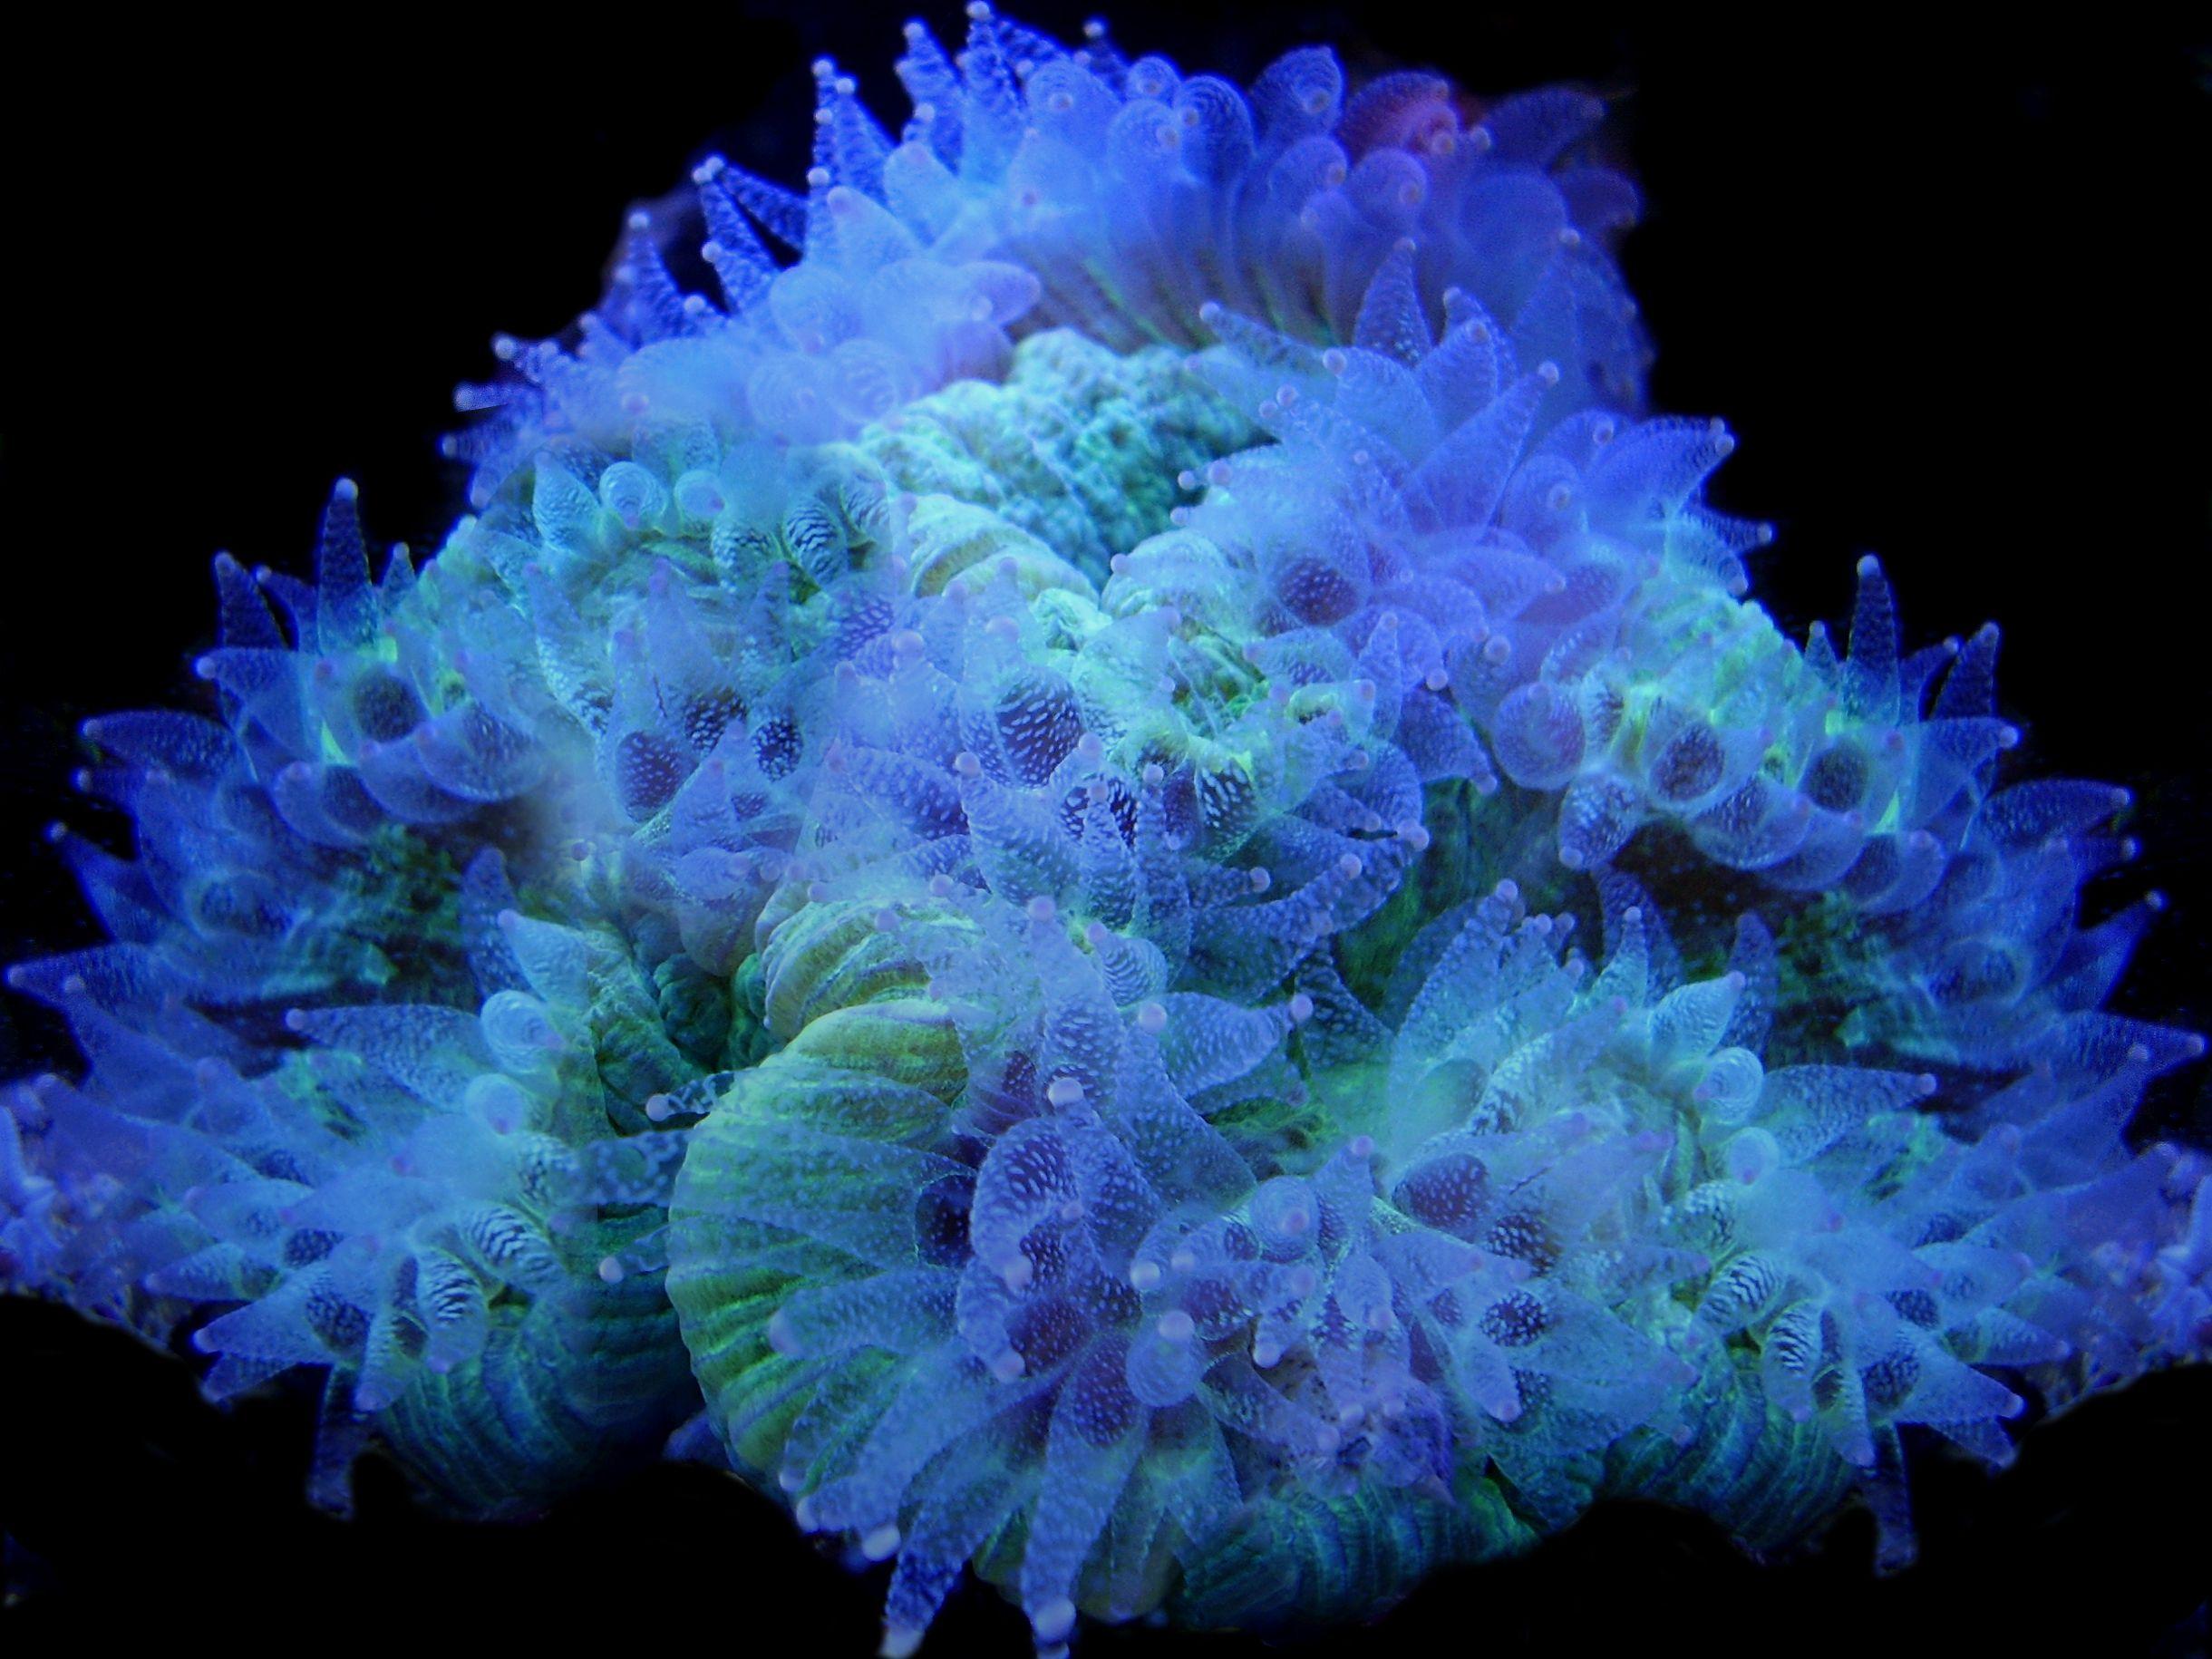 57899d14c8bc2ba207d02d14c08256d7 Frais De Tuyau Aquarium Des Idées